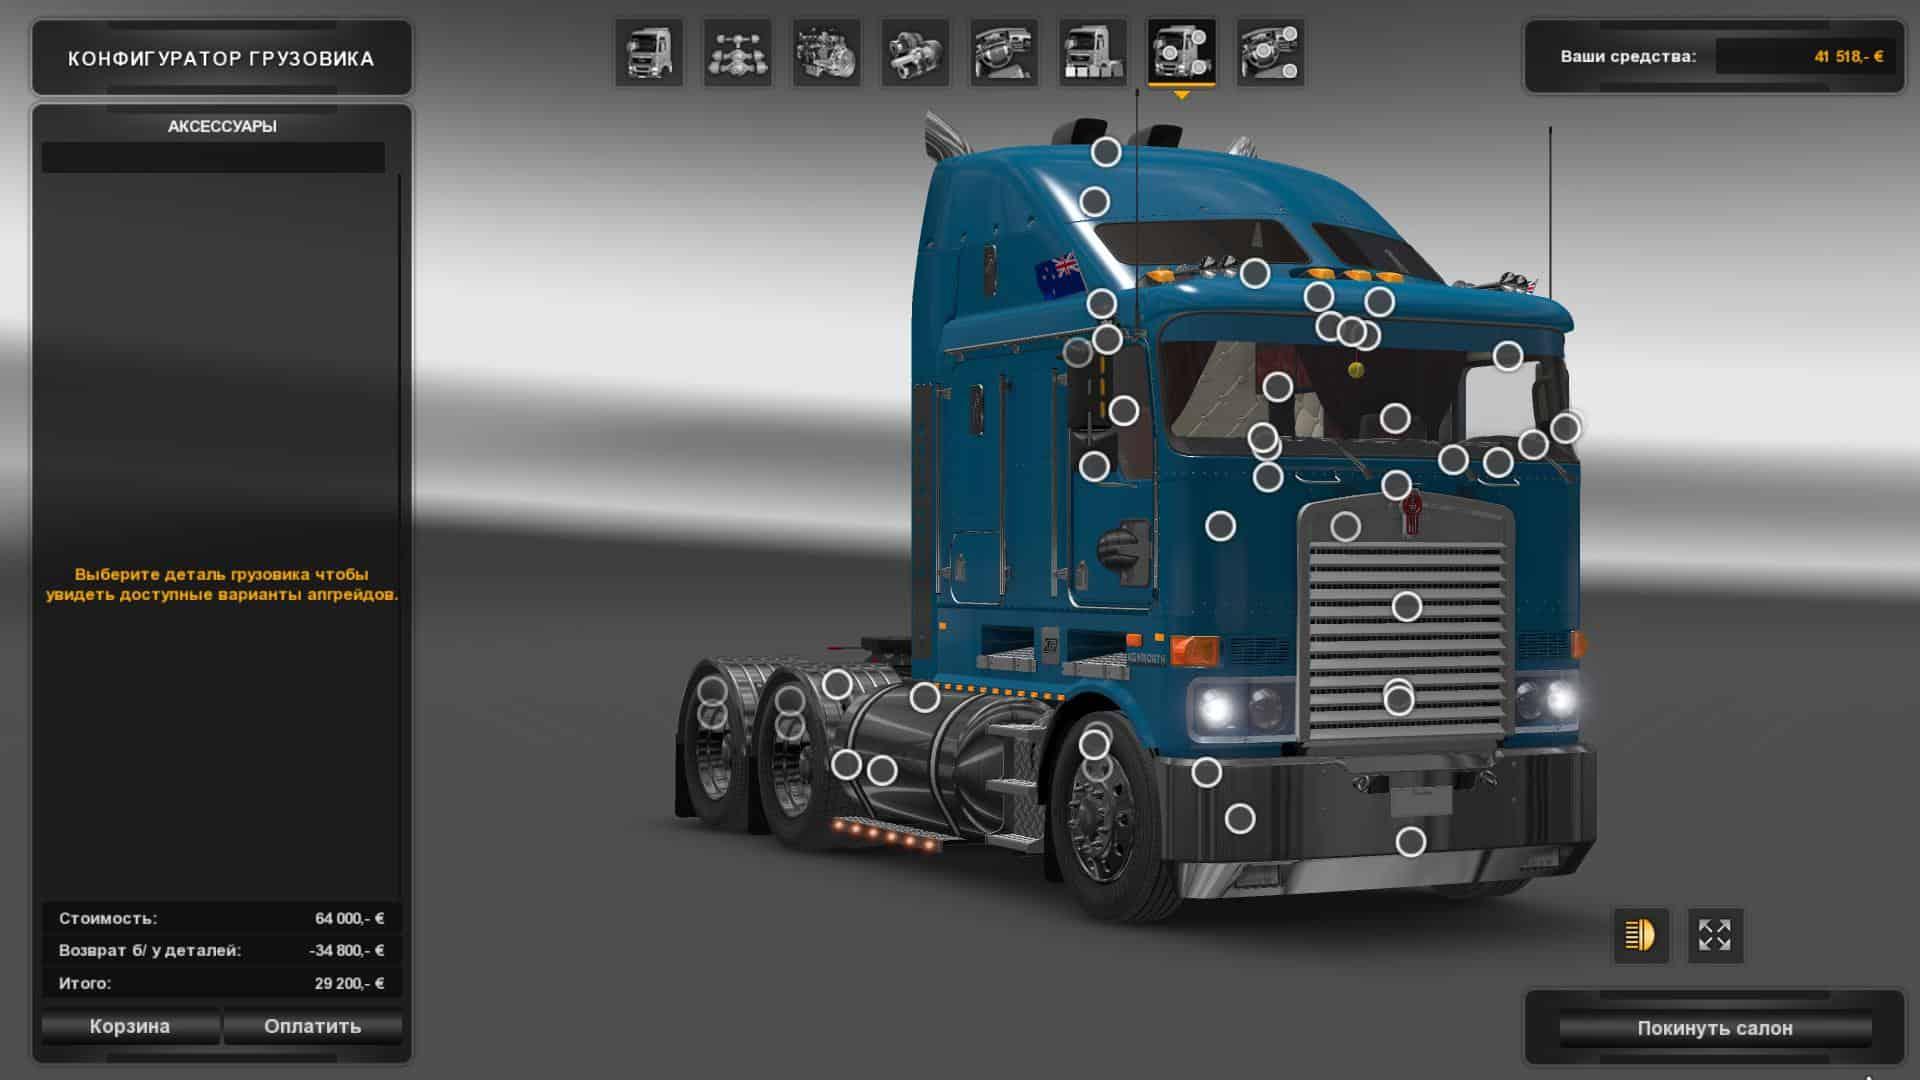 V8 illegal reworked truck v5 0 simulator games mods download - X Truck American Truck Simulator Mods